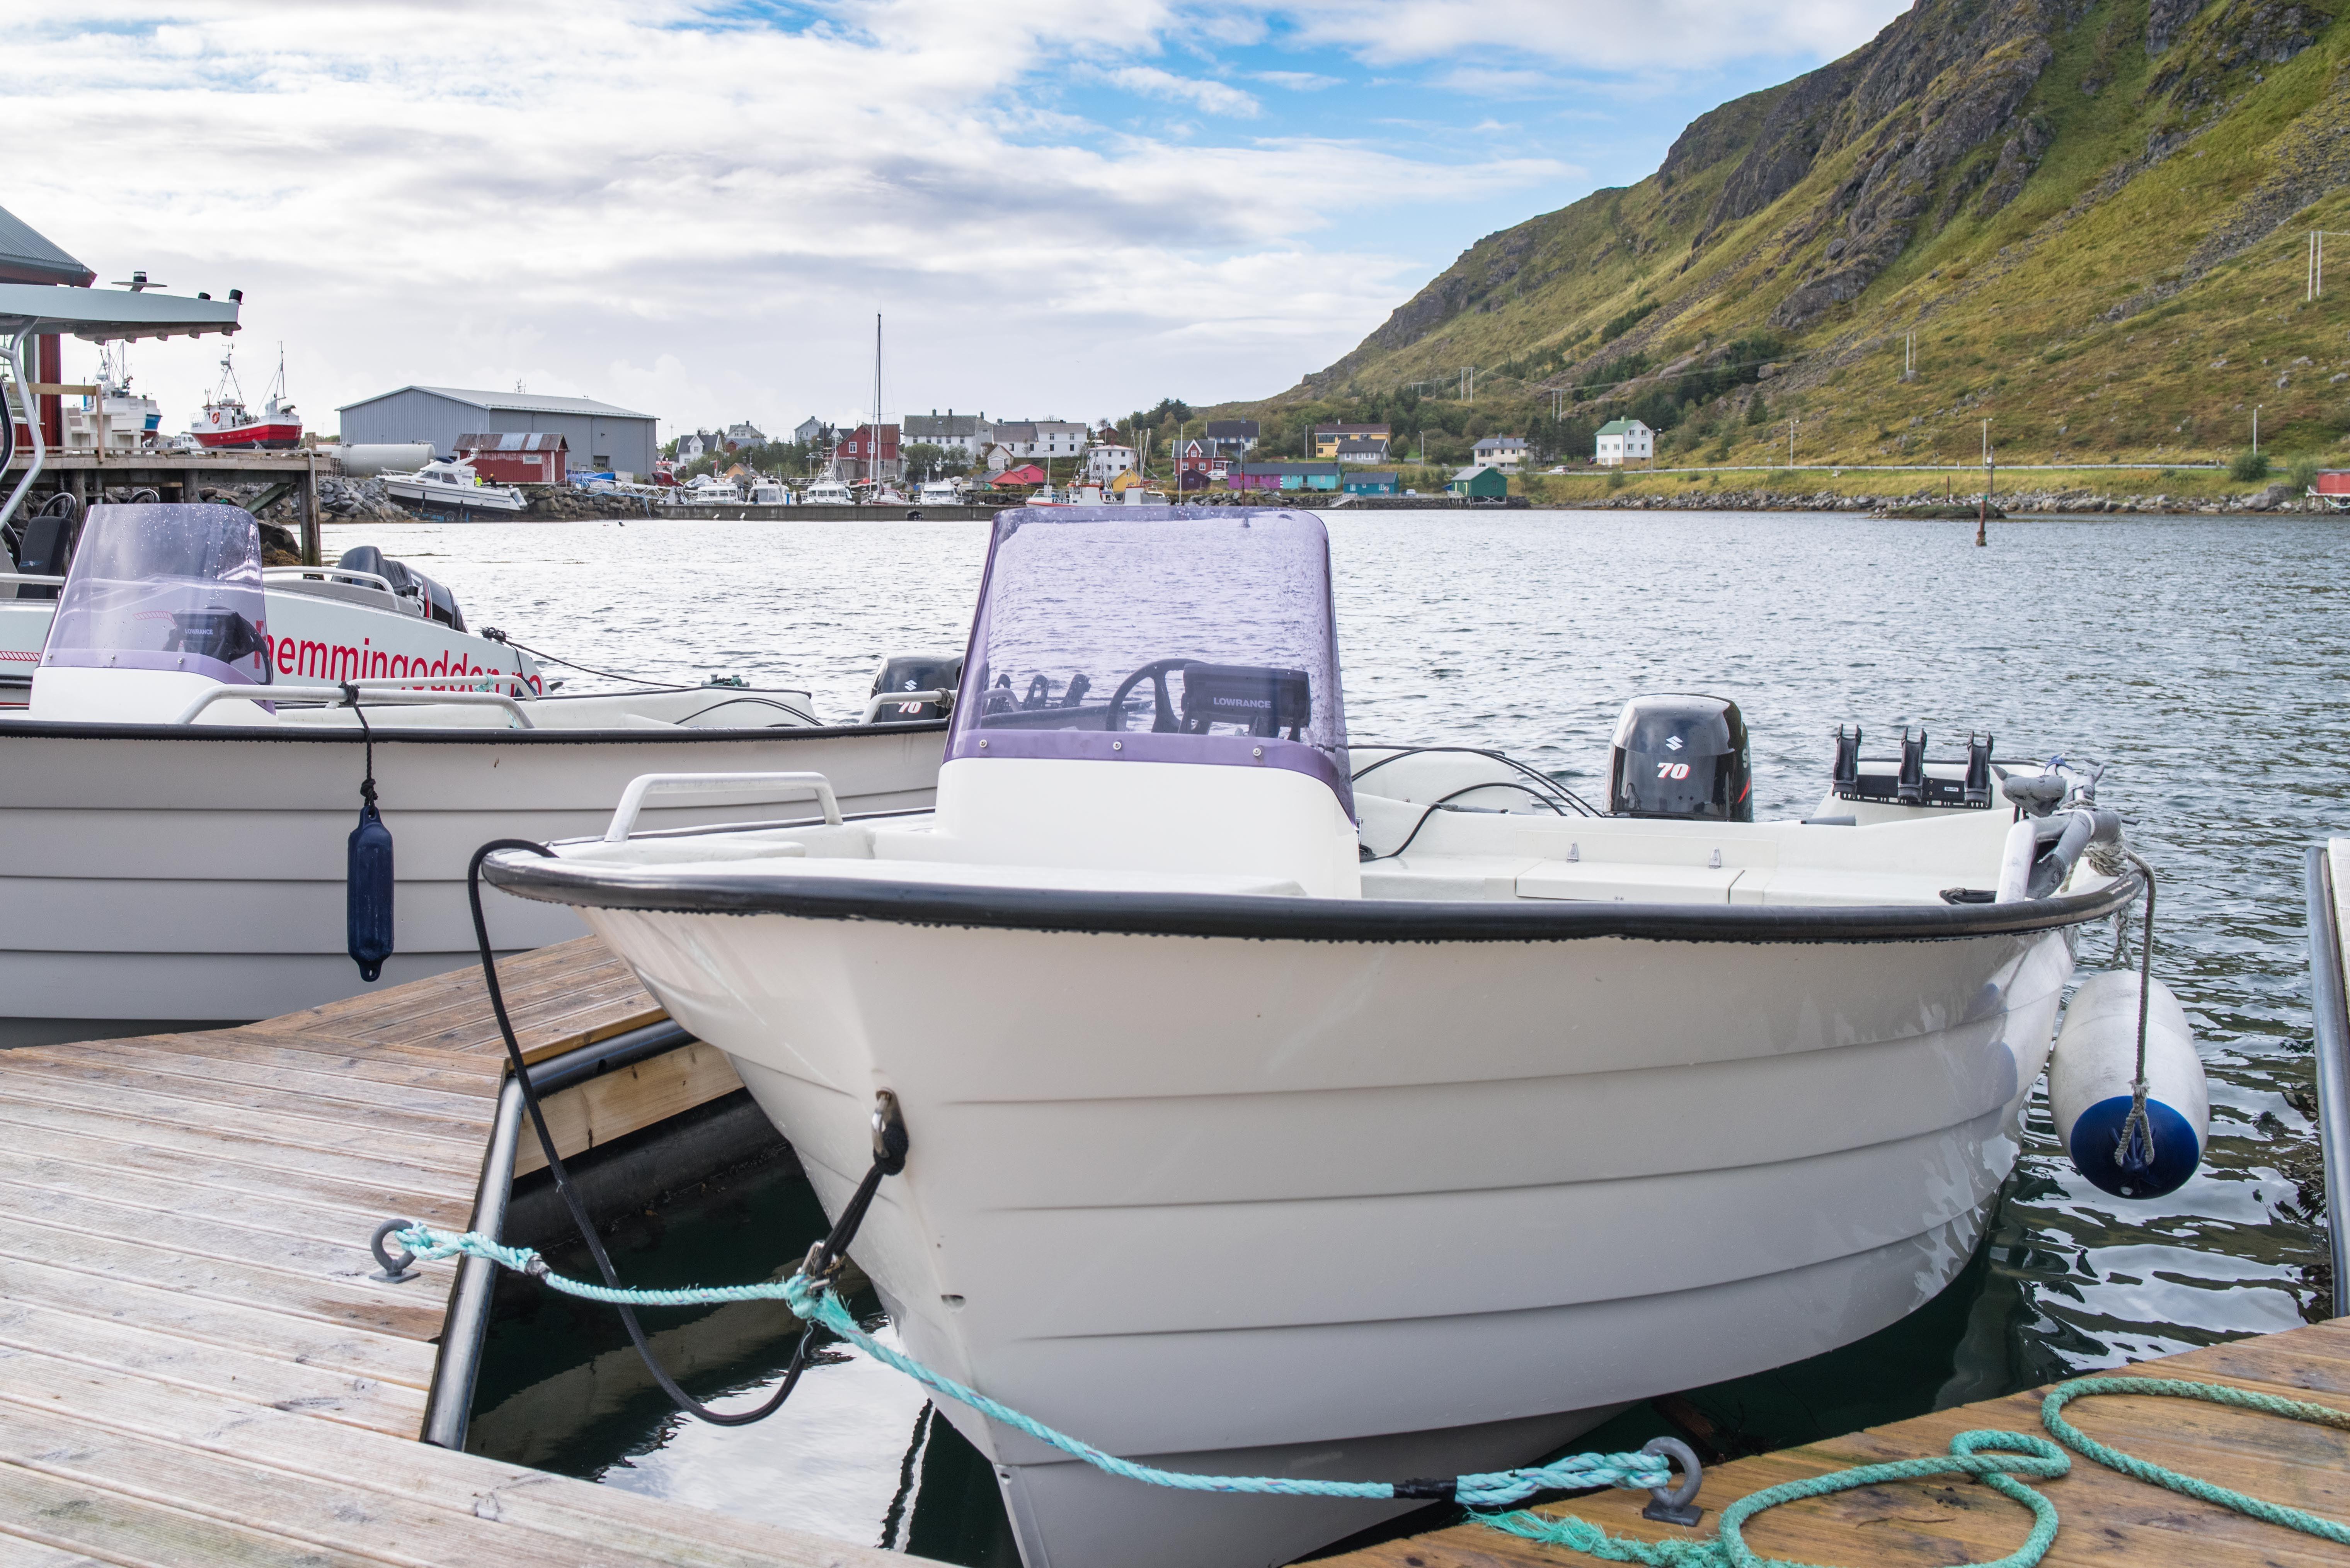 Boat rental in Ballstad - Hemmingodden Lofoten Fishing Lodge